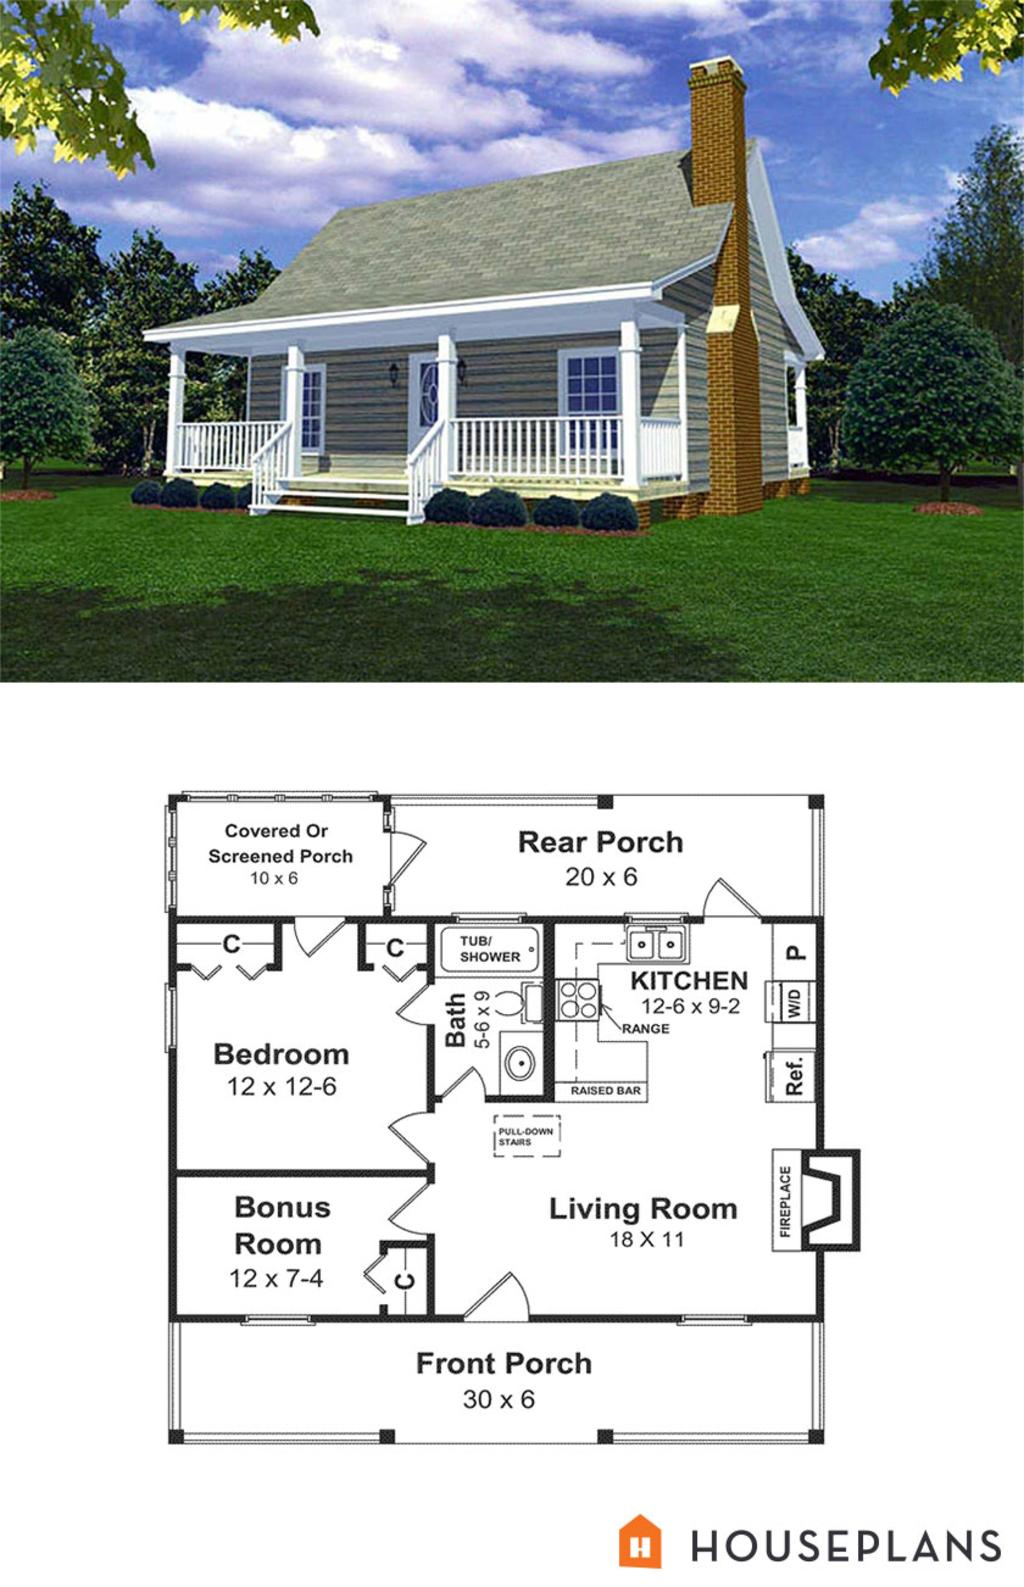 Cabin Style House Plan  1 Beds 1 Baths 600 SqFt Plan 21